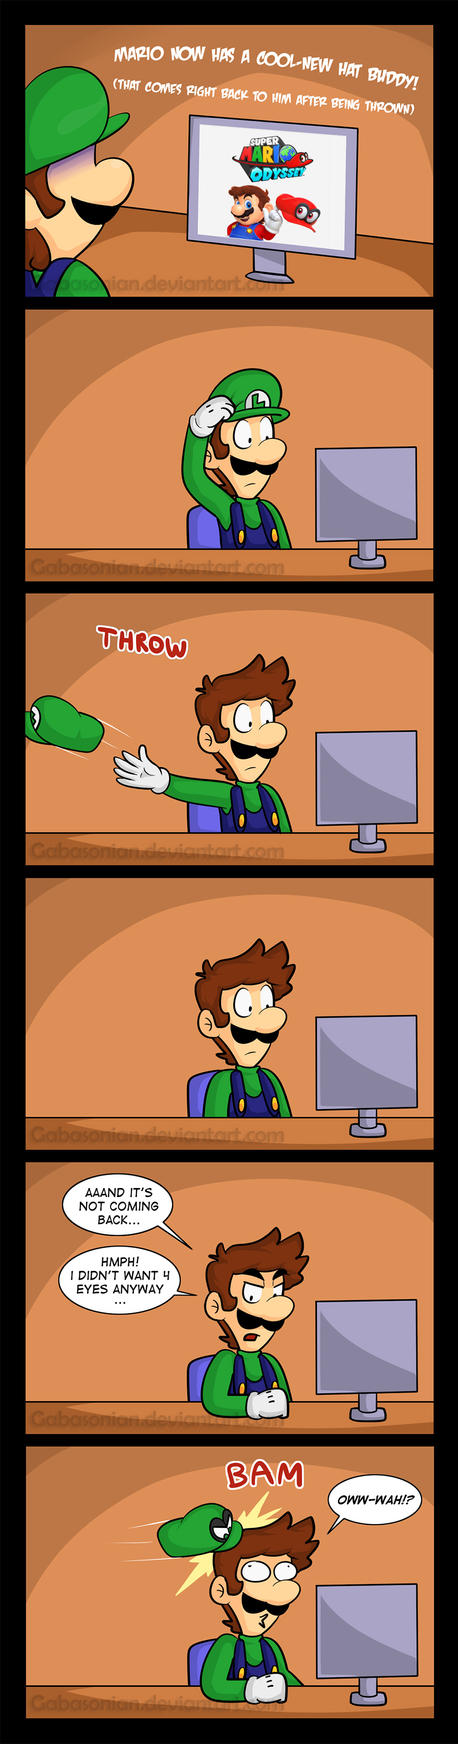 Luigi Wants Some Mario Odyssey Too [Comic + Dub] by Gabasonian